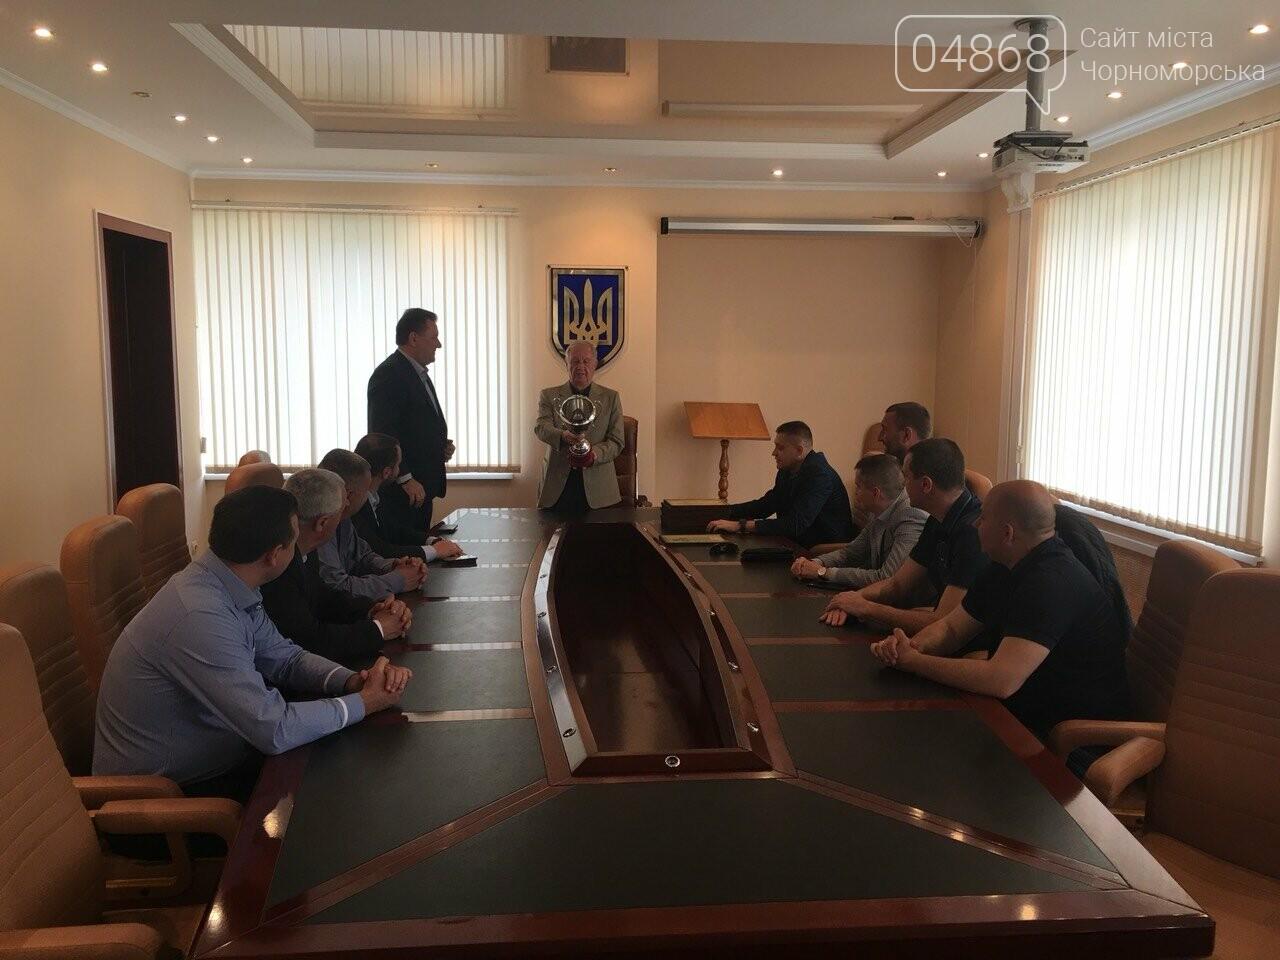 Городской голова поздравил победителей Чемпионата Черноморска по баскетболу (+ФОТО), фото-1